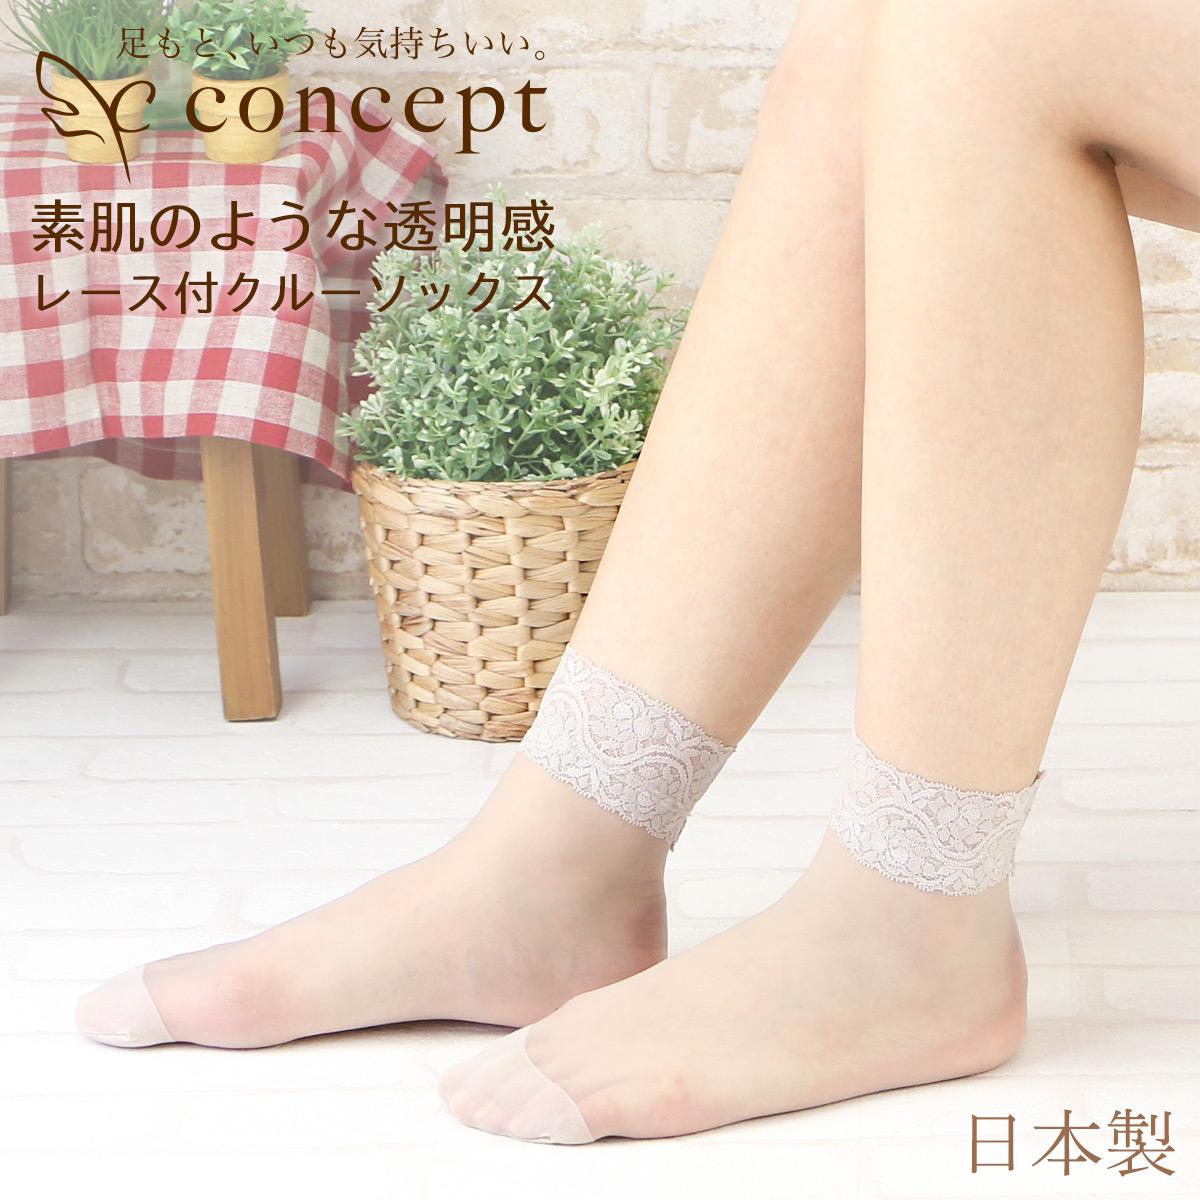 ac2d67e66 Wear the crew length socks of the mini-length pantyhose socks Naigai  concept pantyhose material